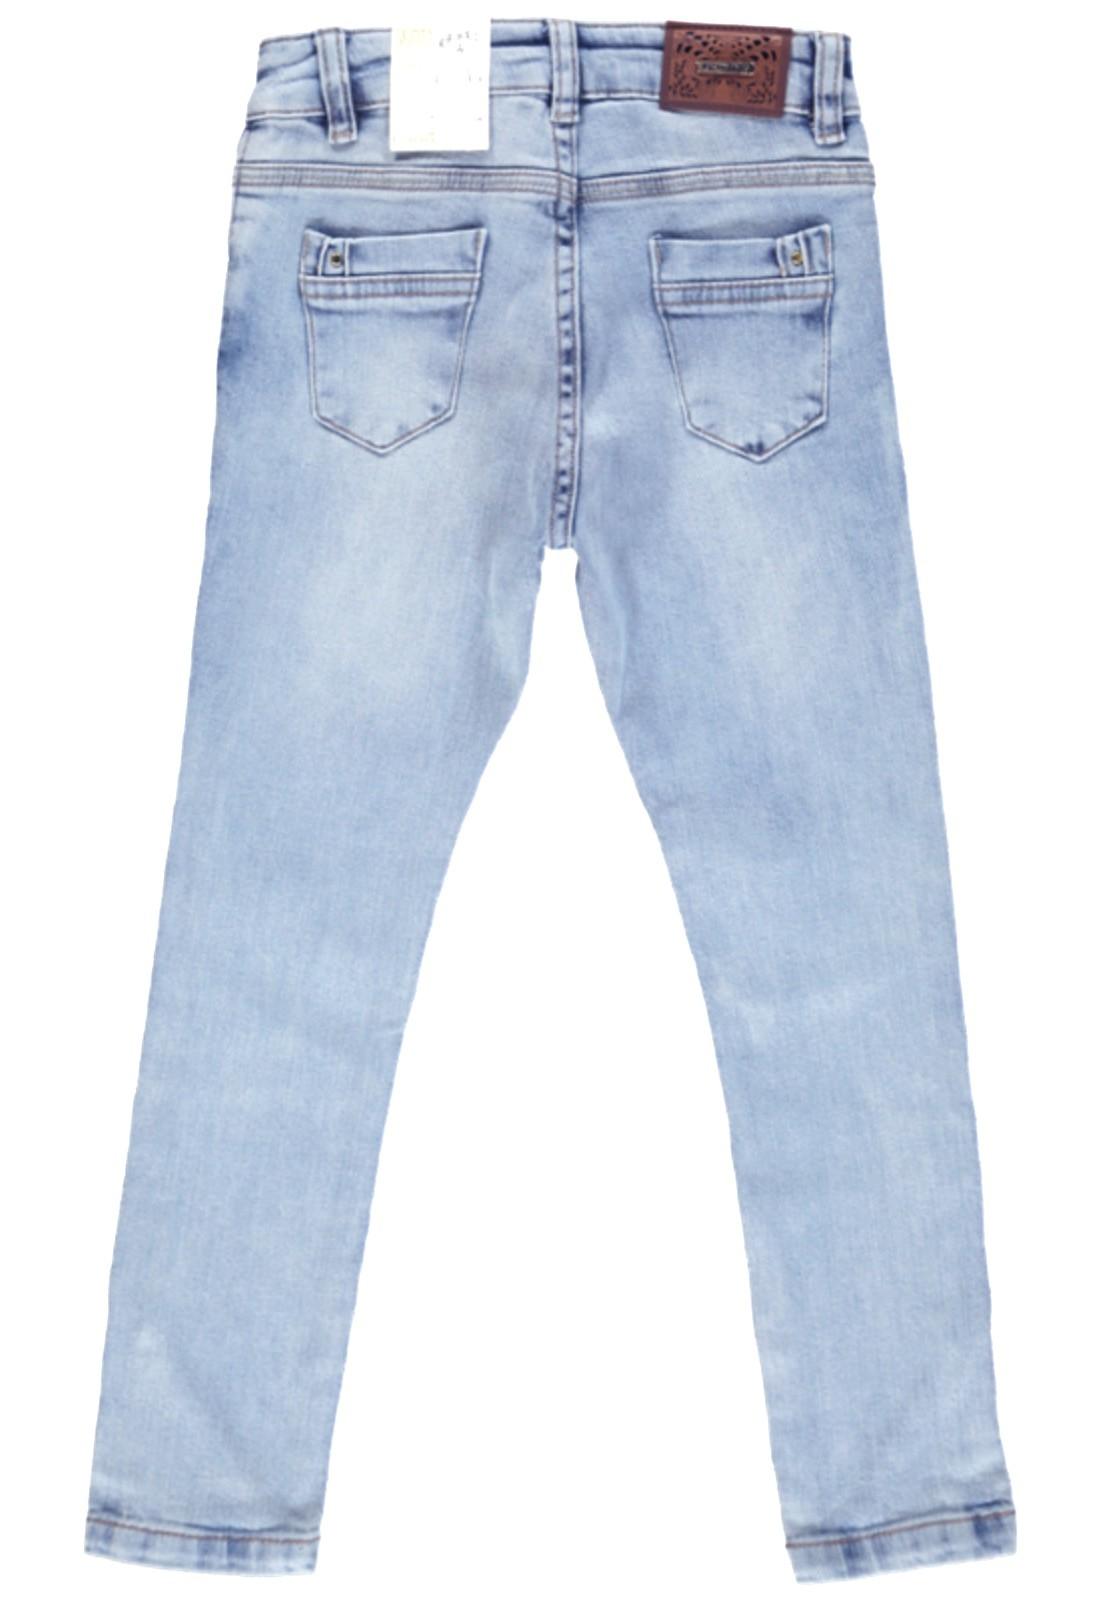 Calça Feminina C/Strass Crawling Skinny Jeans